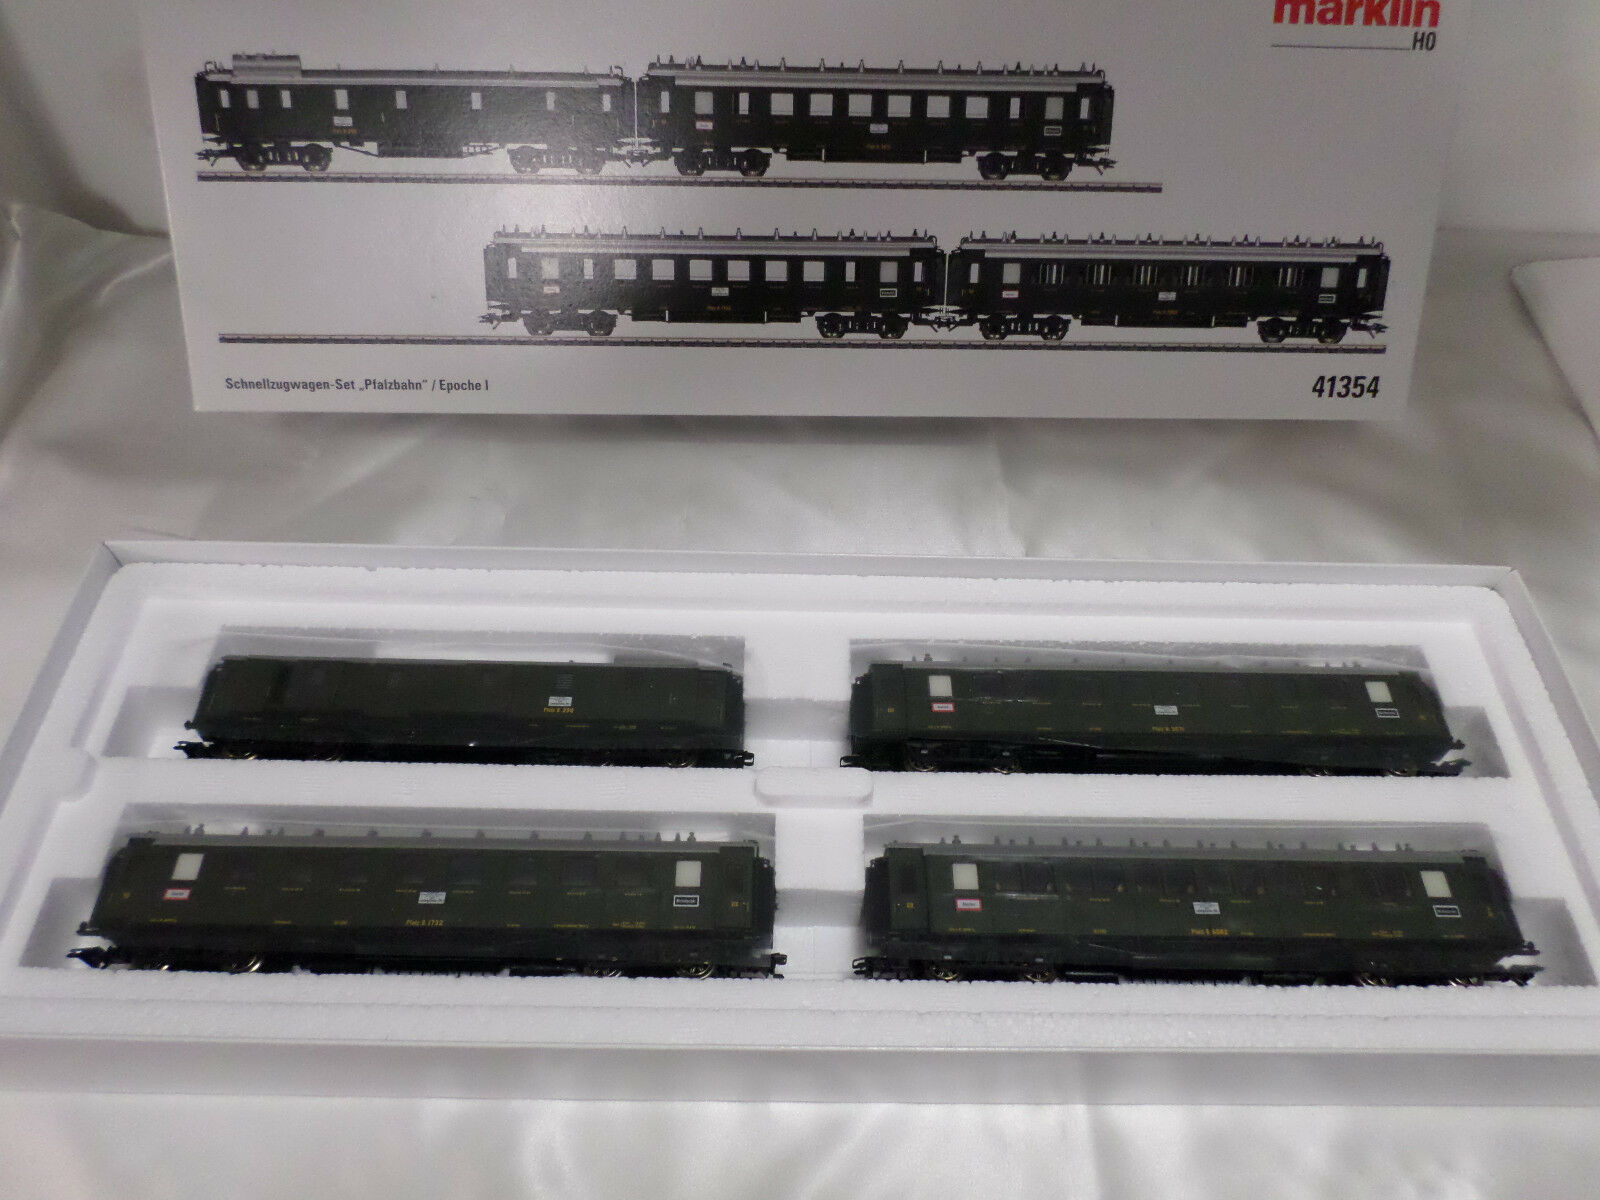 Marklin 41354 HO Palatine Railroad Express Train Passenger Car Set